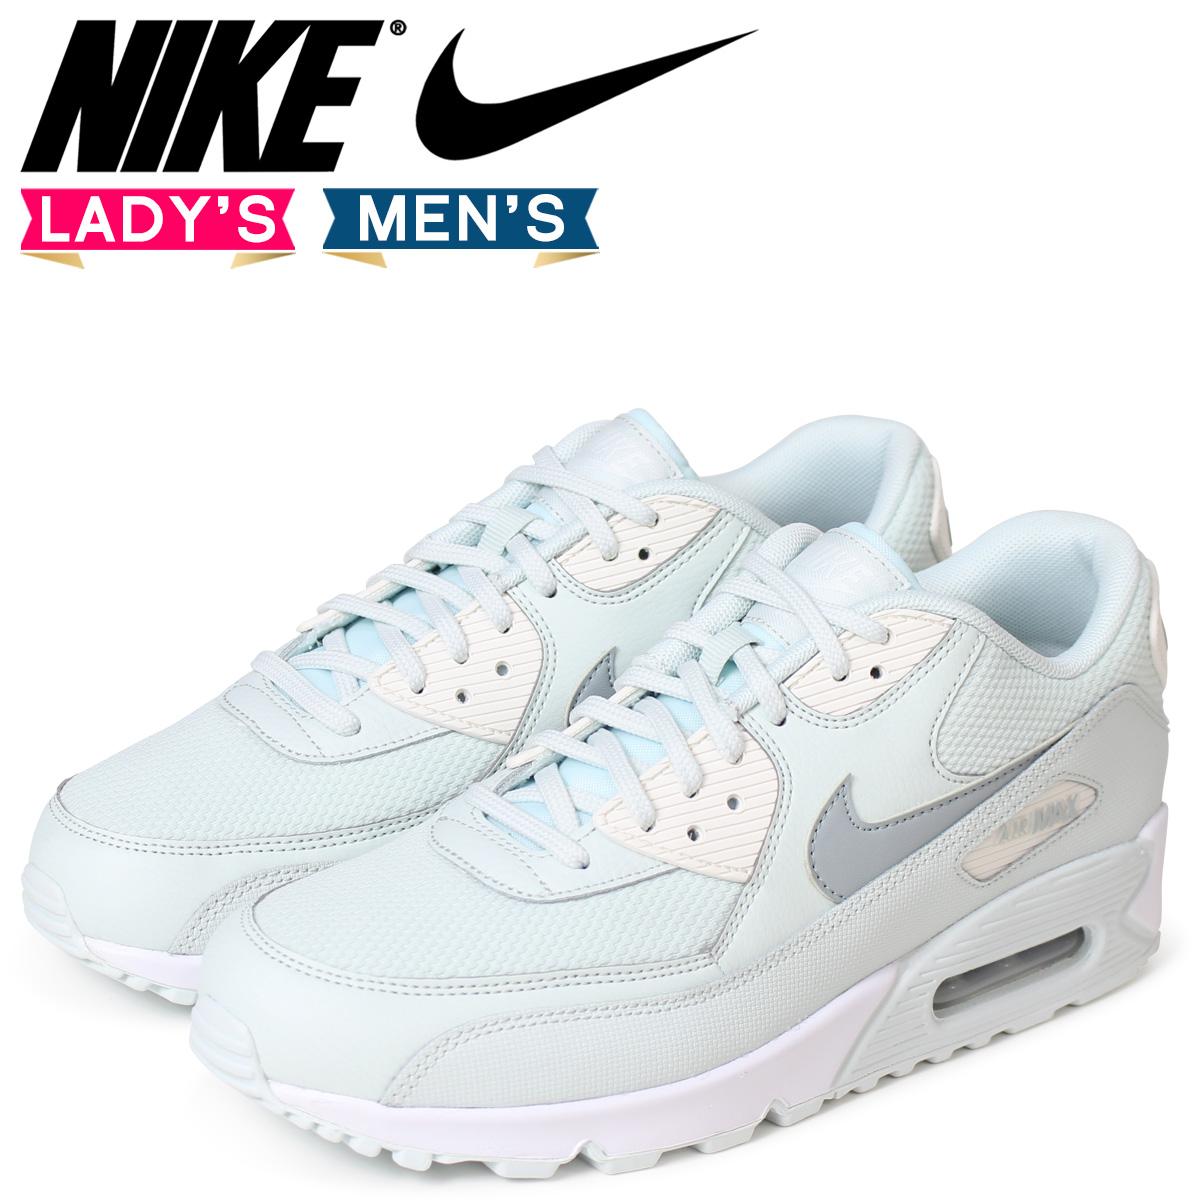 7d0f84af5b NIKE Kie Ney AMAX 90 lady's men's sneakers WMNS AIR MAX 90 325,213-053 light  ...